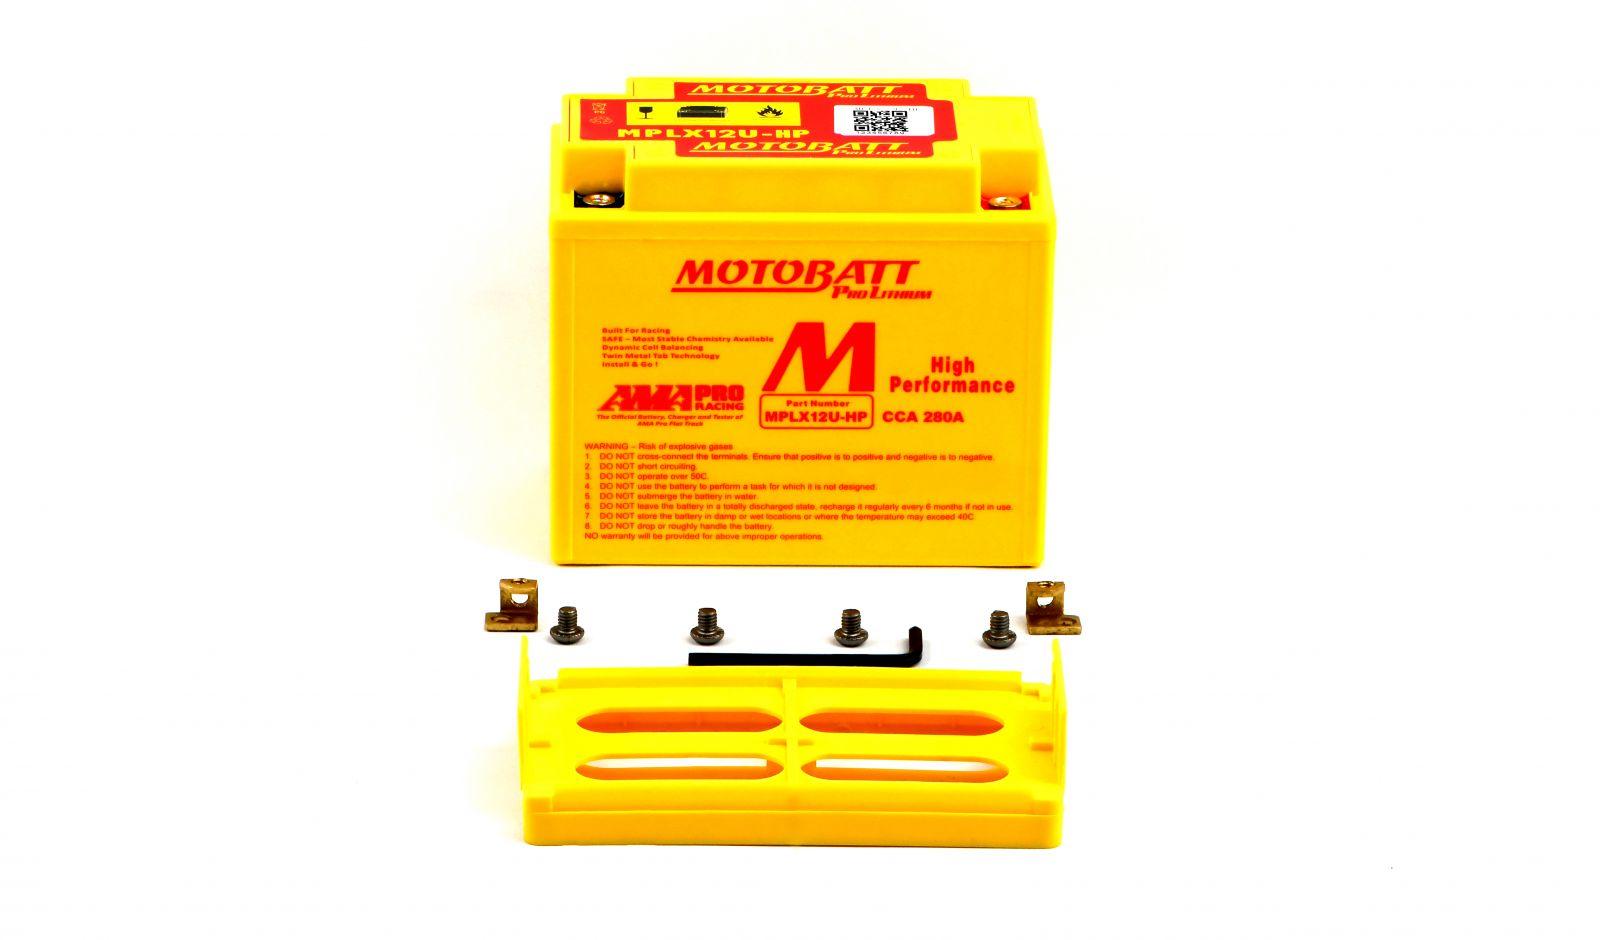 motobatt lithium batteries - 501125MR image